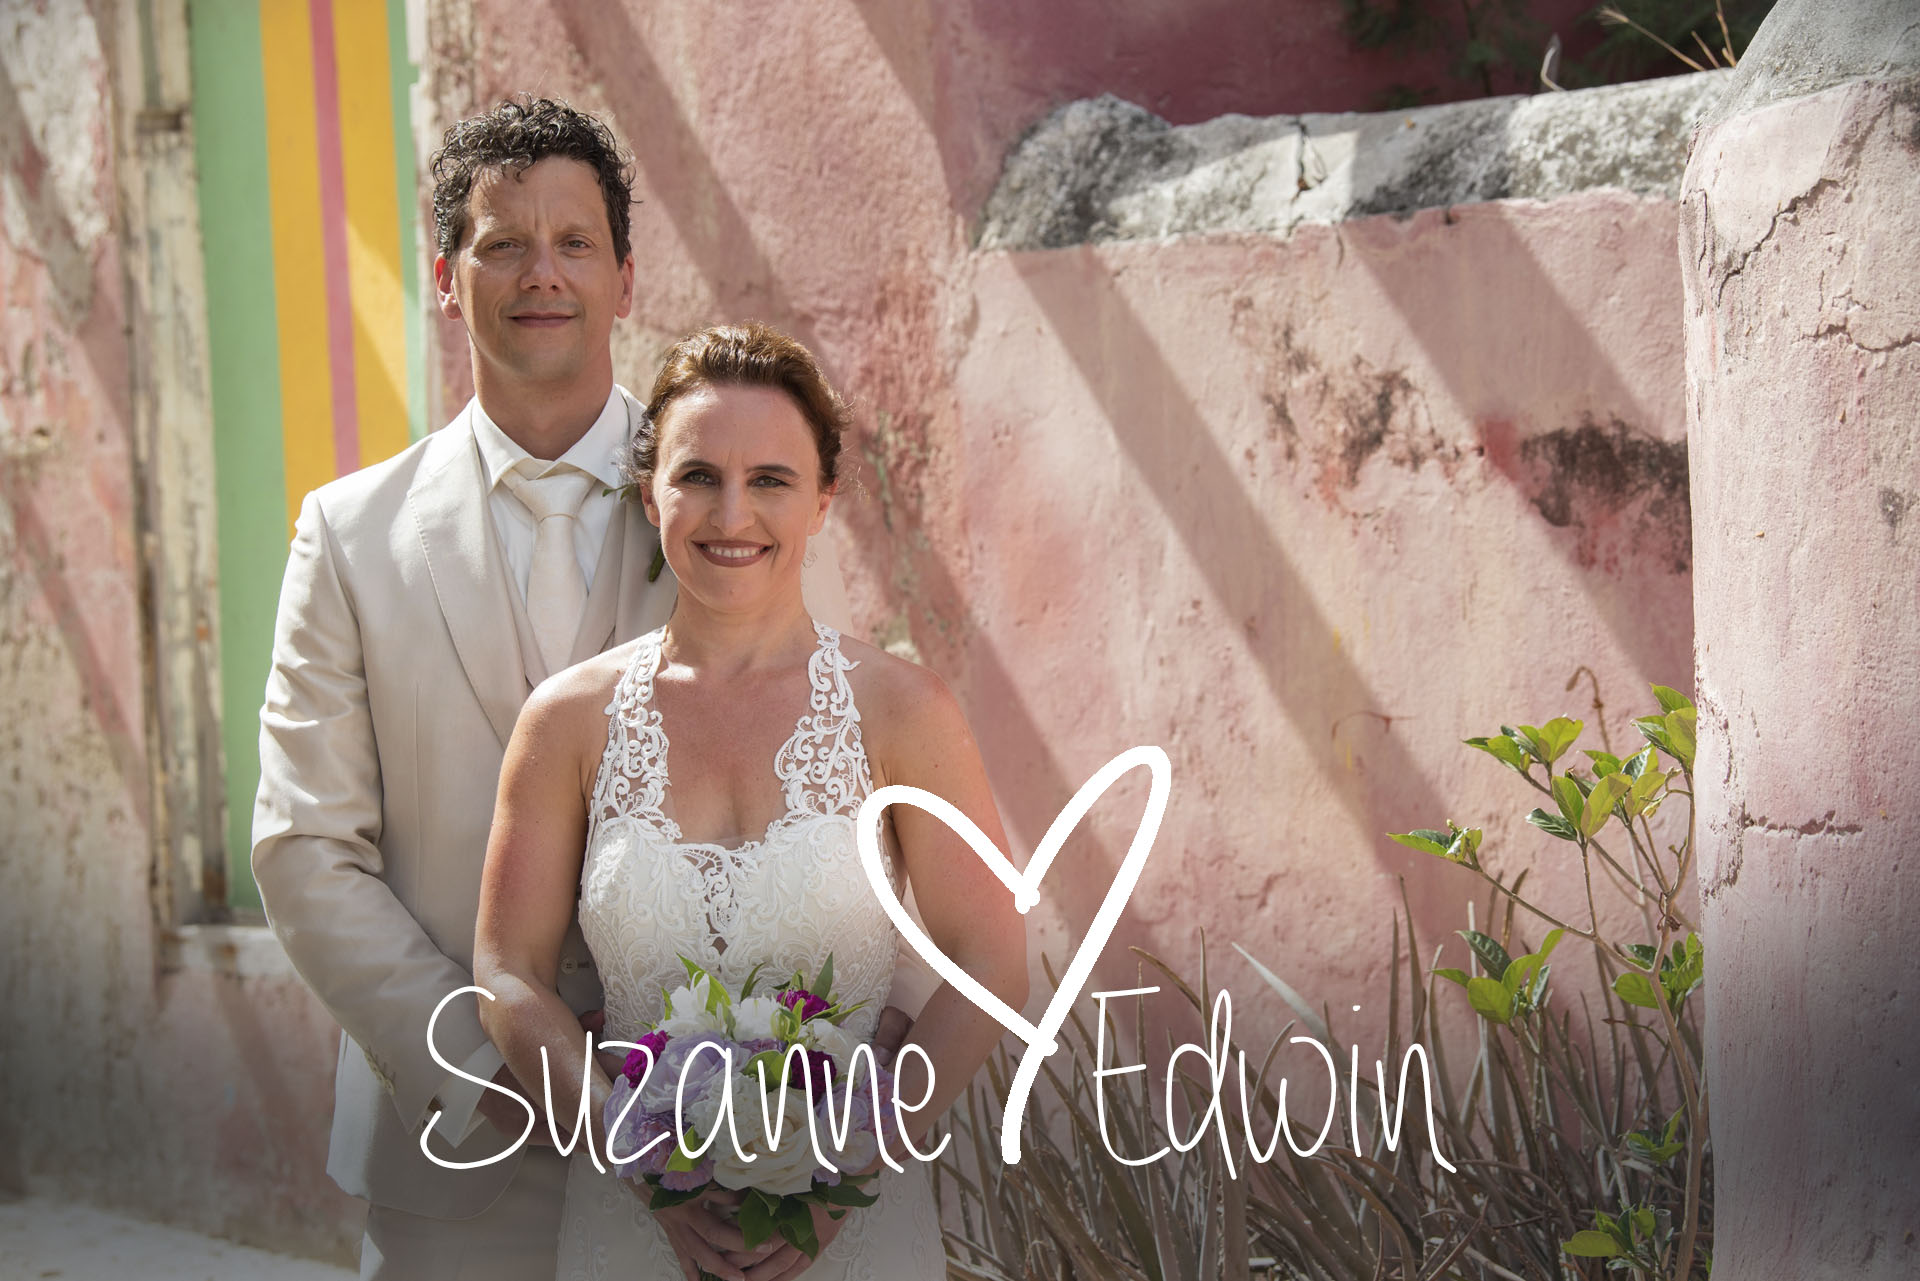 Suzanne & Edwin